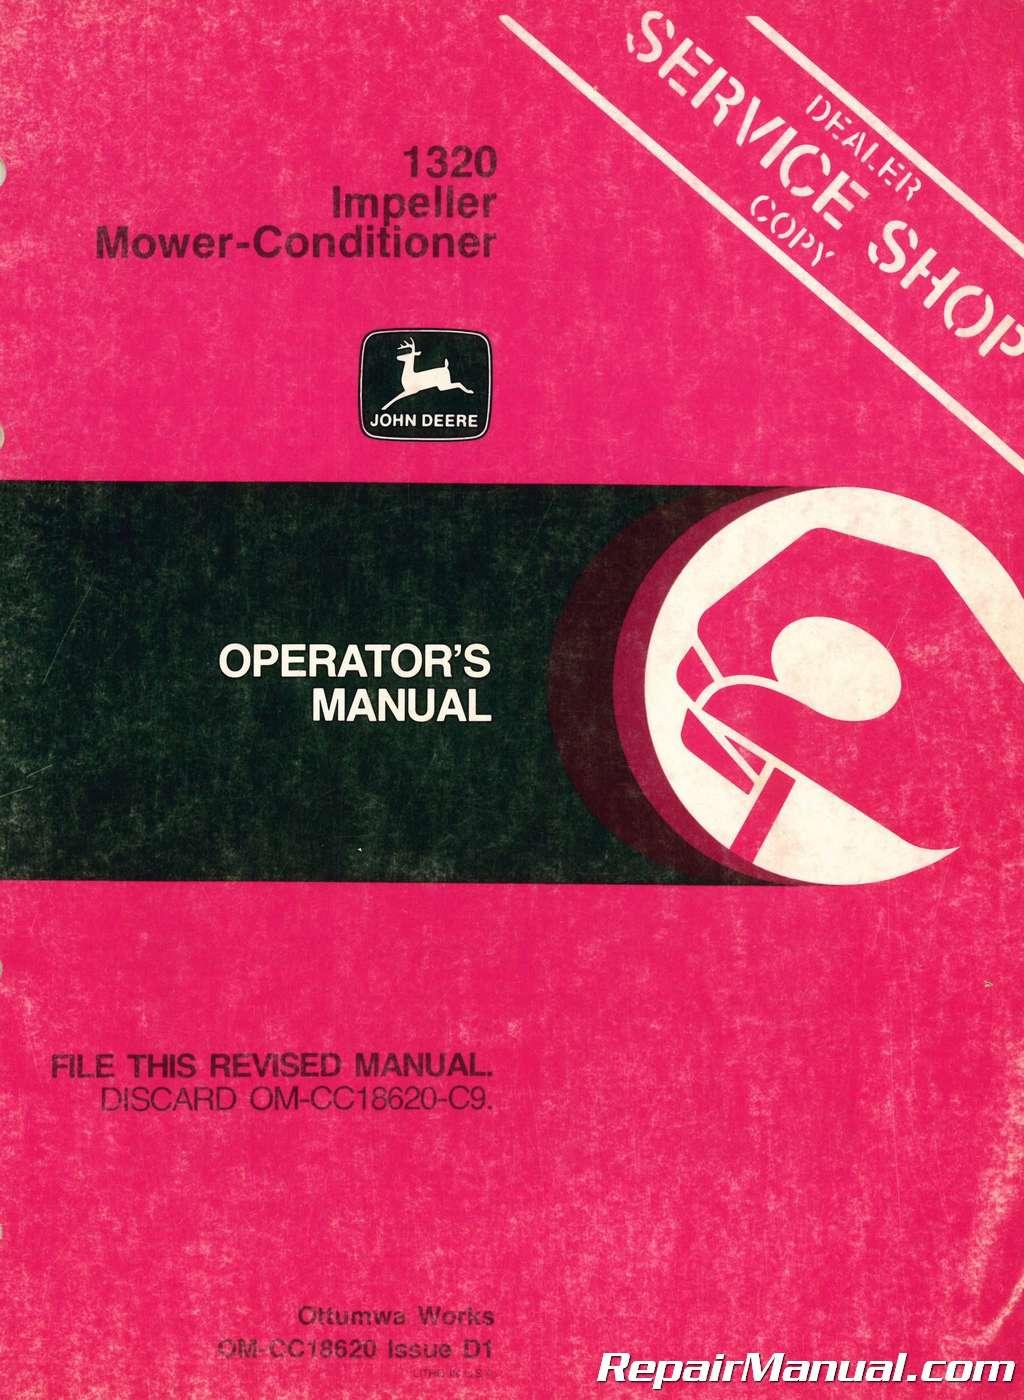 Used John Deere 1320 Impeller Mower-Conditioner Operators Manual